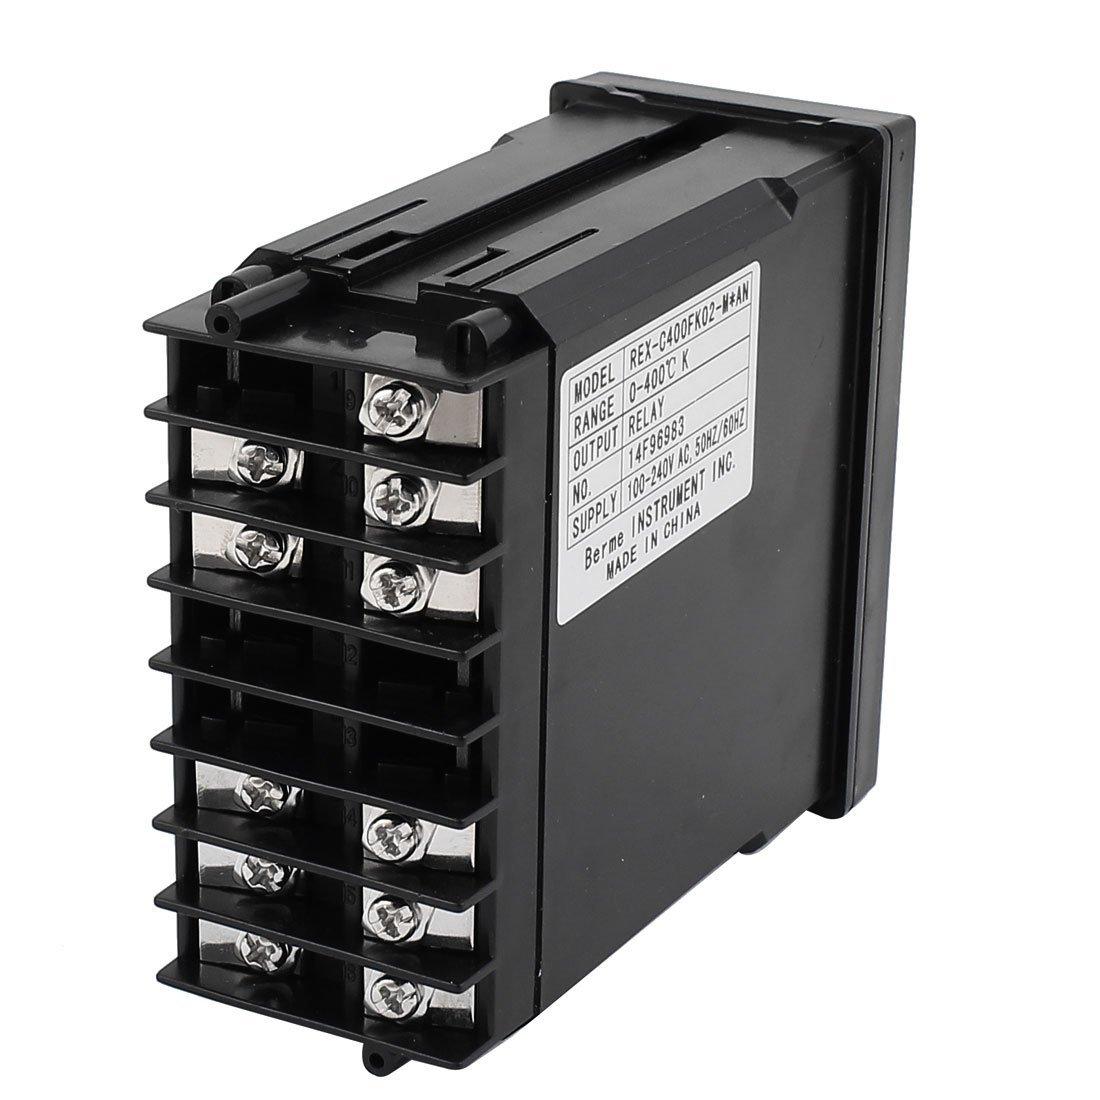 DealMux AC 110-220V LCD controlador de temperatura do termostato Sensor: Amazon.com: Industrial & Scientific